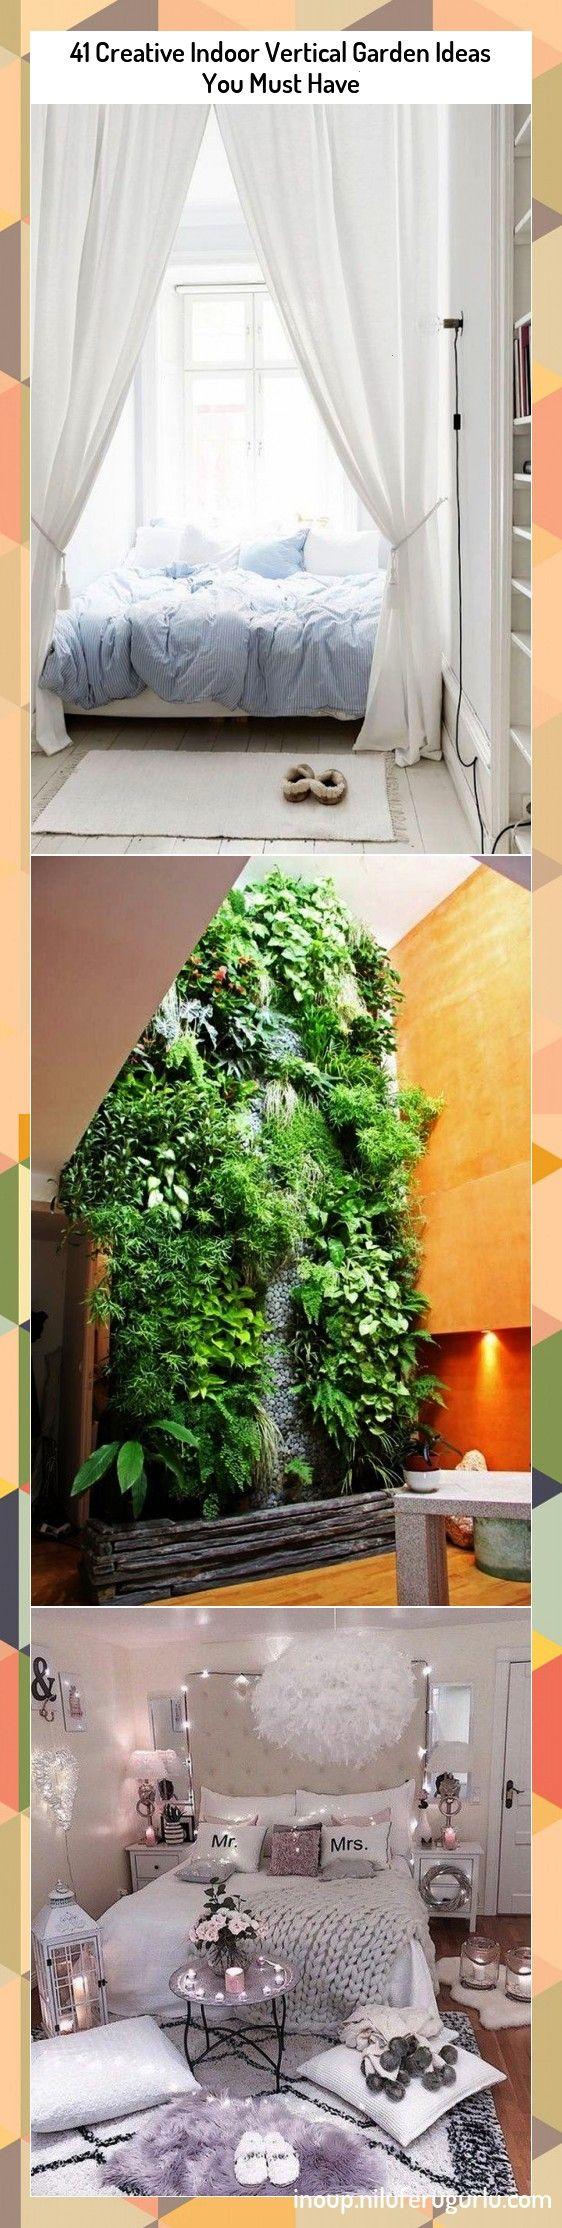 Creative Indoor Vertical Garden Ideas You Must Have41 Creative Indoor Vertical Garden Ideas You Must Have Como esse ambiente transmite tranquilidade zebodeko Confiram tam...